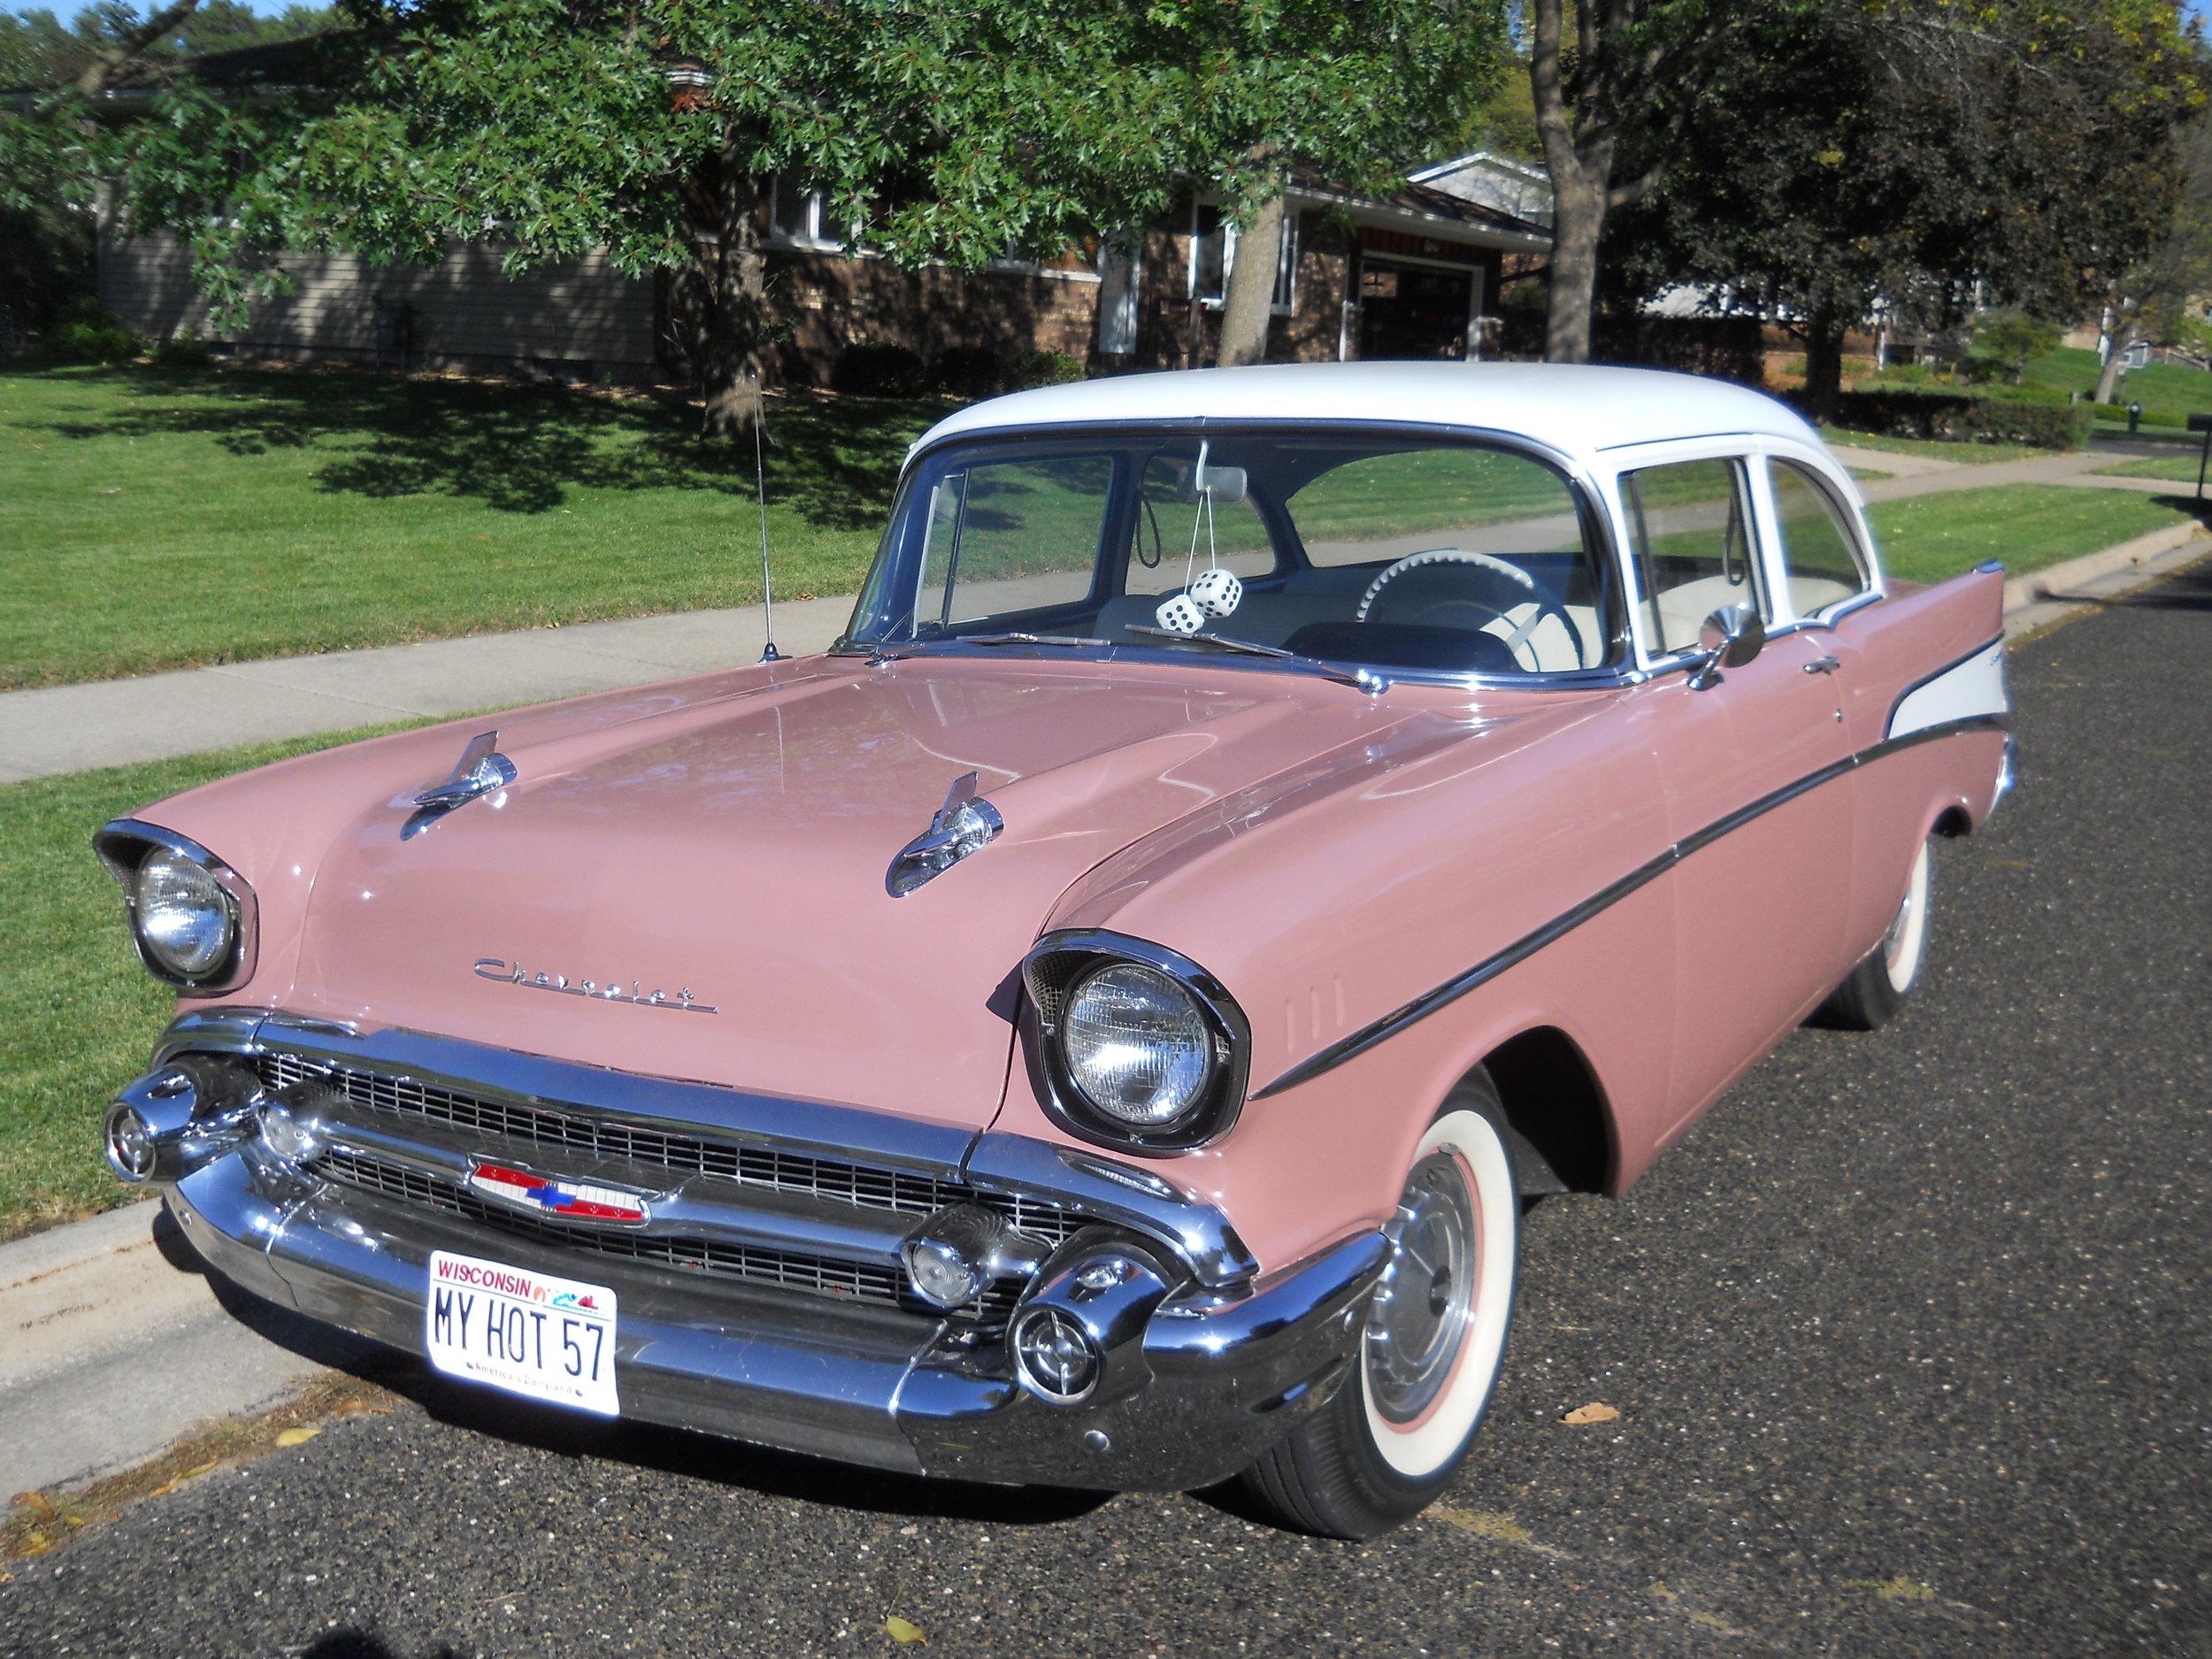 1 1957 Chevrolet 210 Beckman.JPG